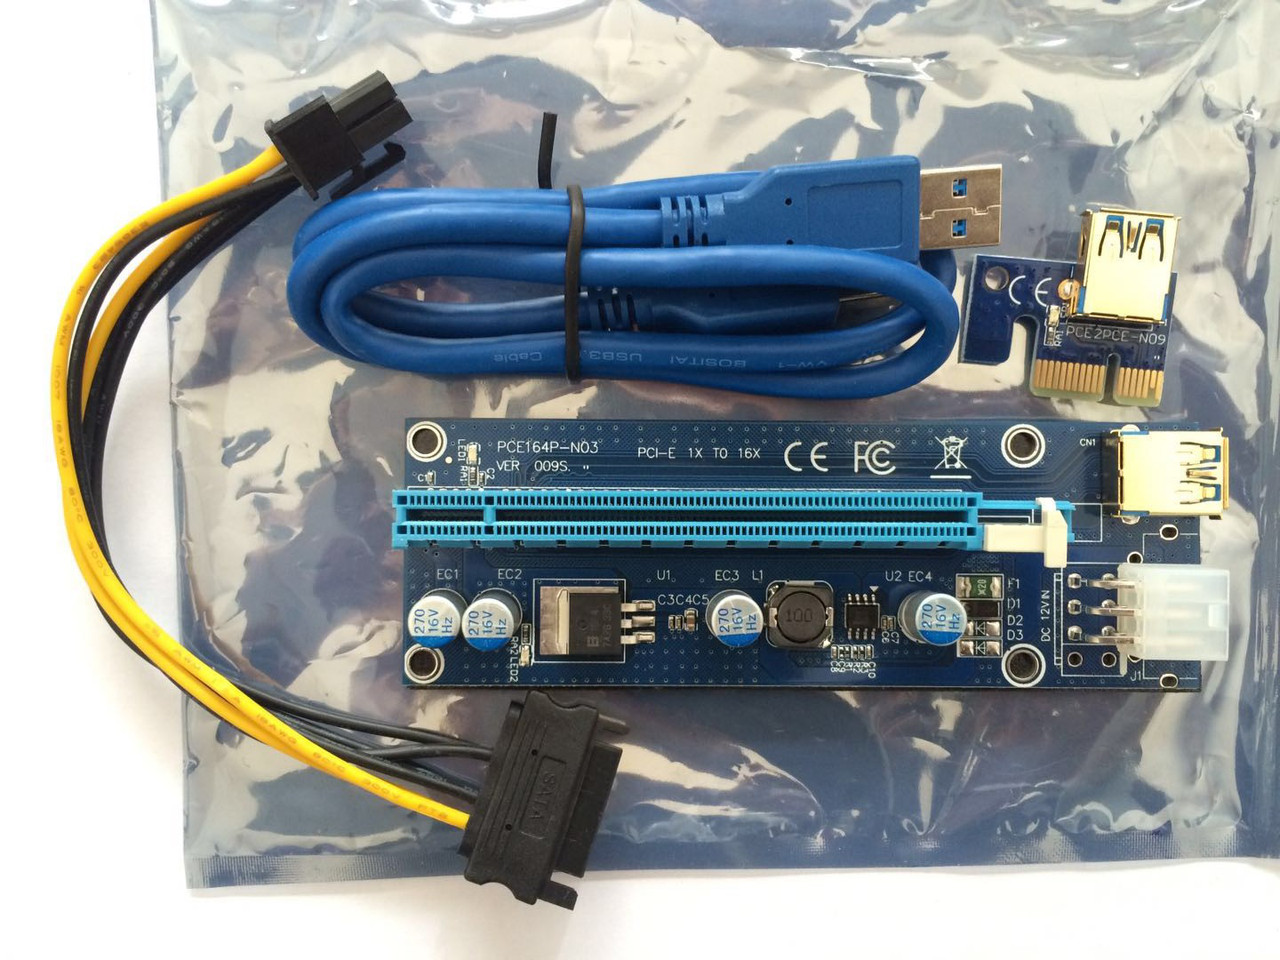 Райзер Riser ver 009s 6PIN PCI-E 1x-16x